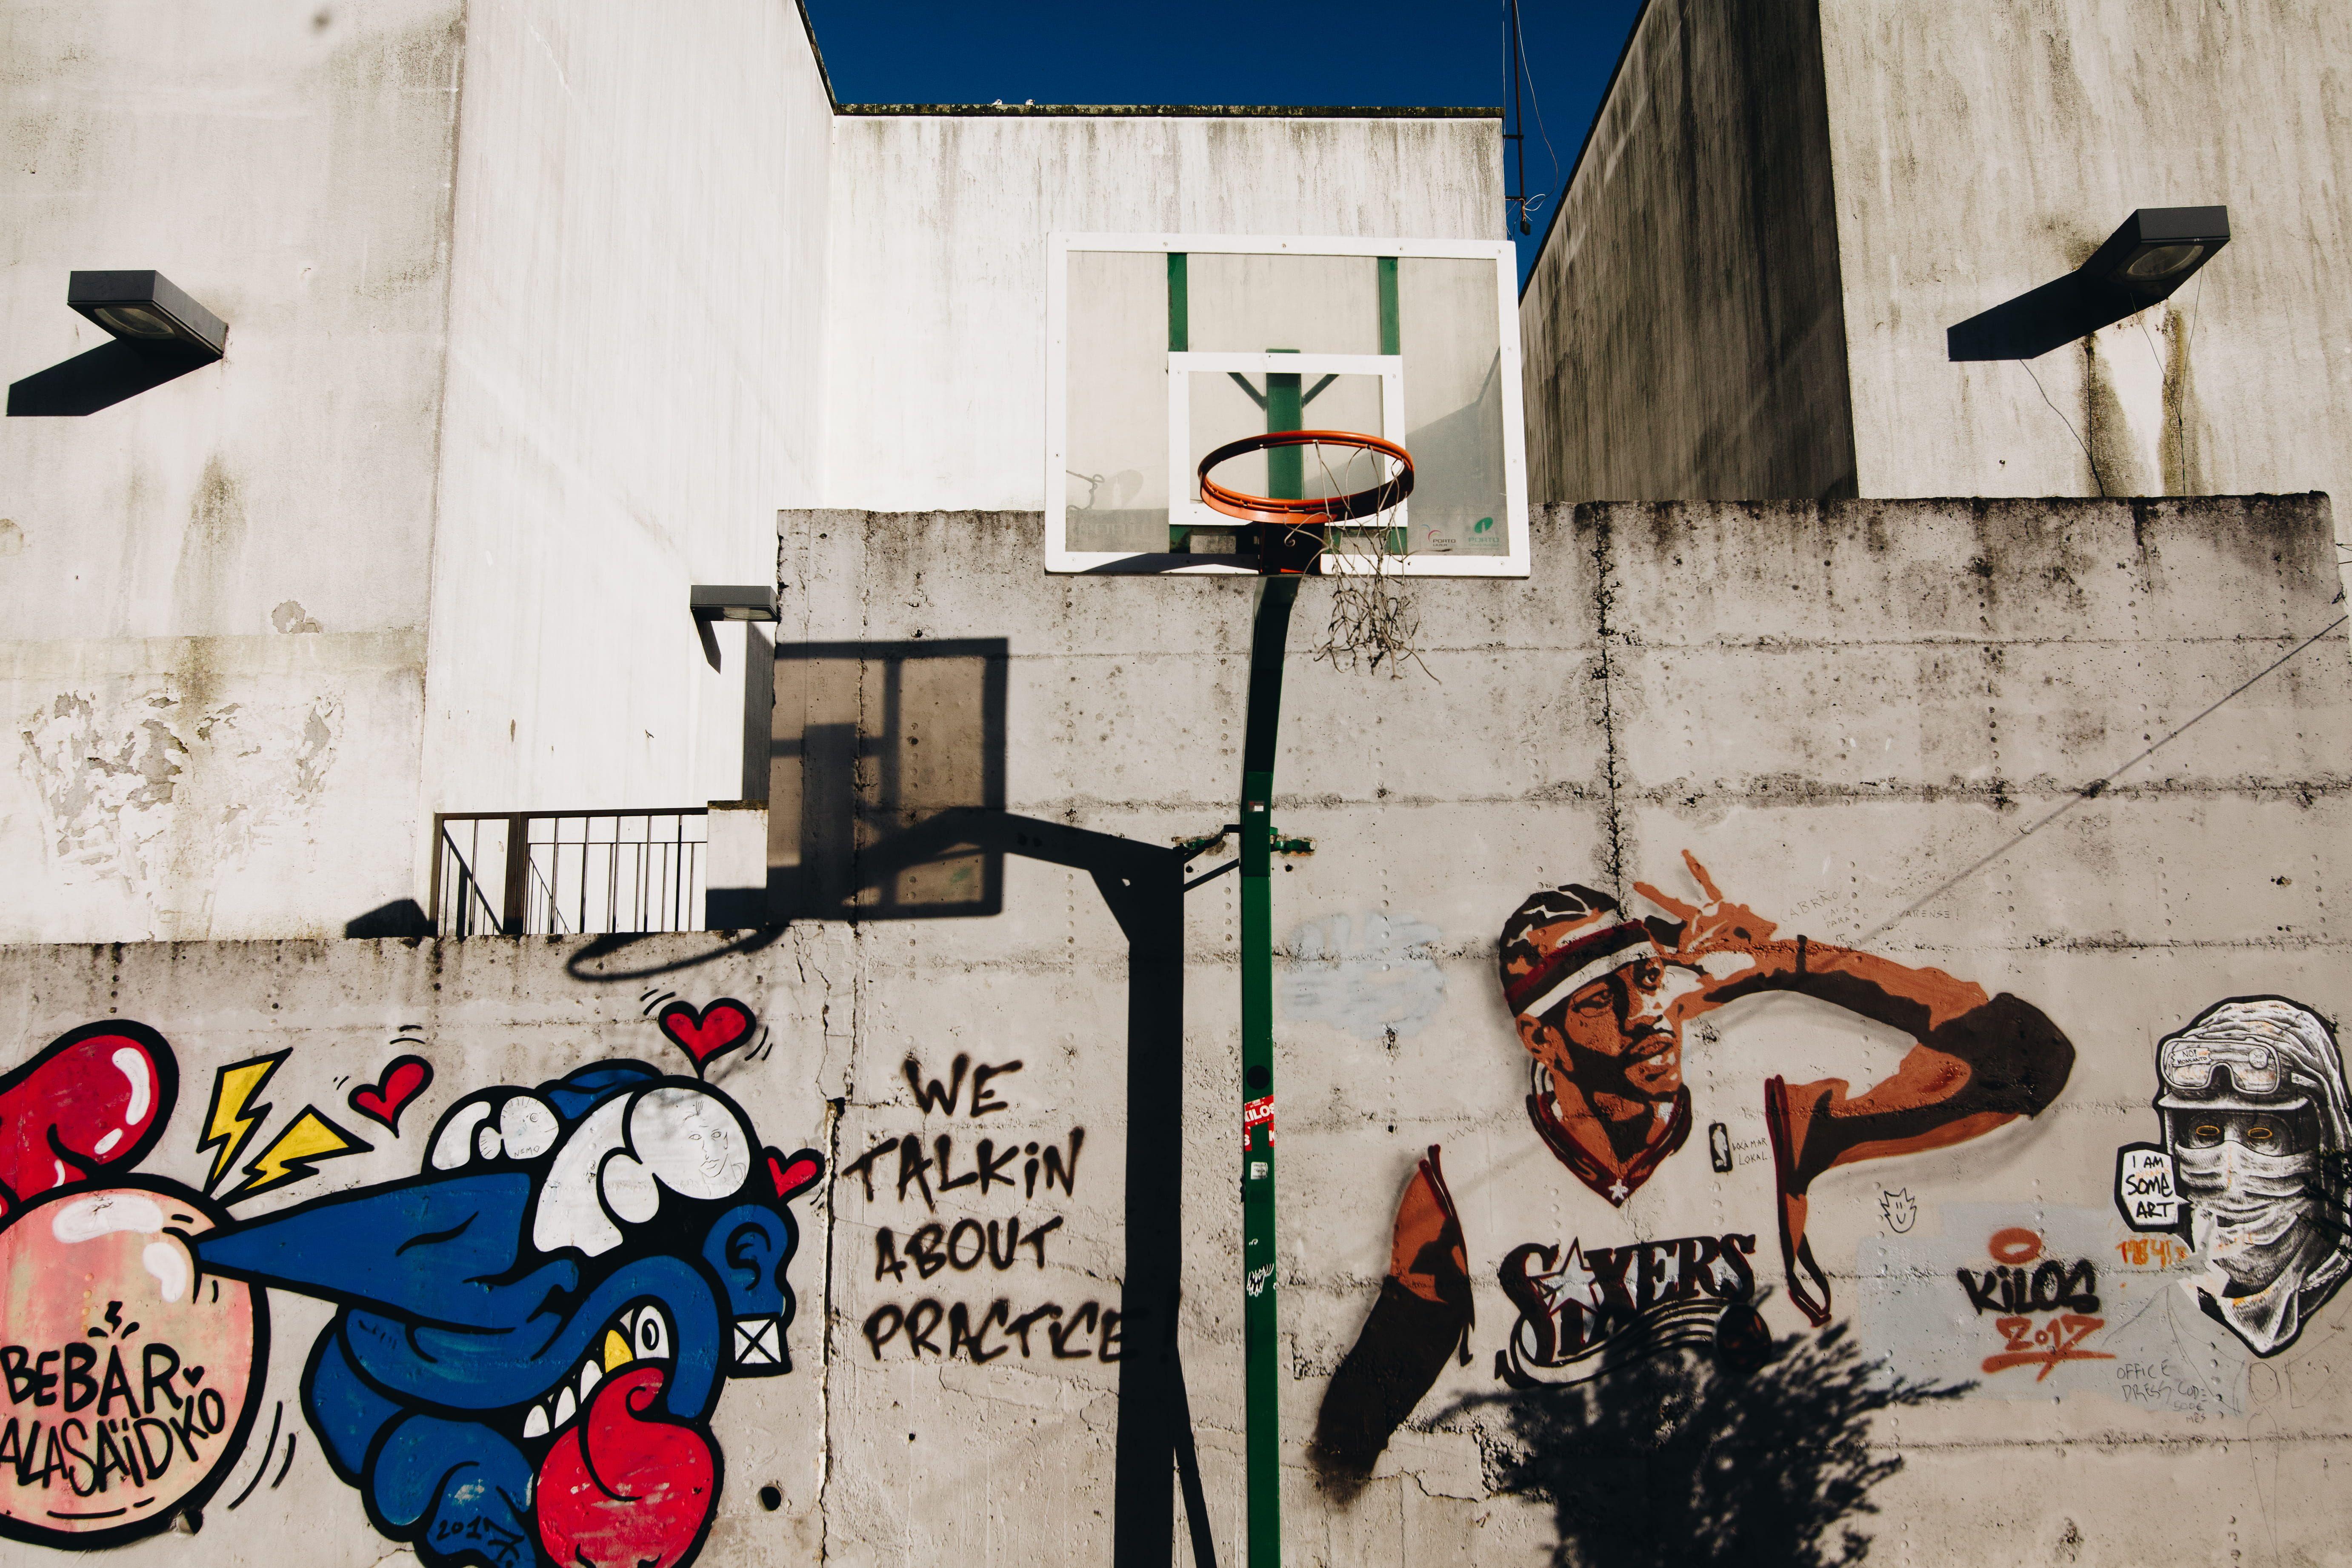 Allen Iverson Of Sixers Graffiti Wall Art Basketball Basket Basketball Court Building City Daytime Graffiti Painting Pavement Sport Str Basketbol Resim